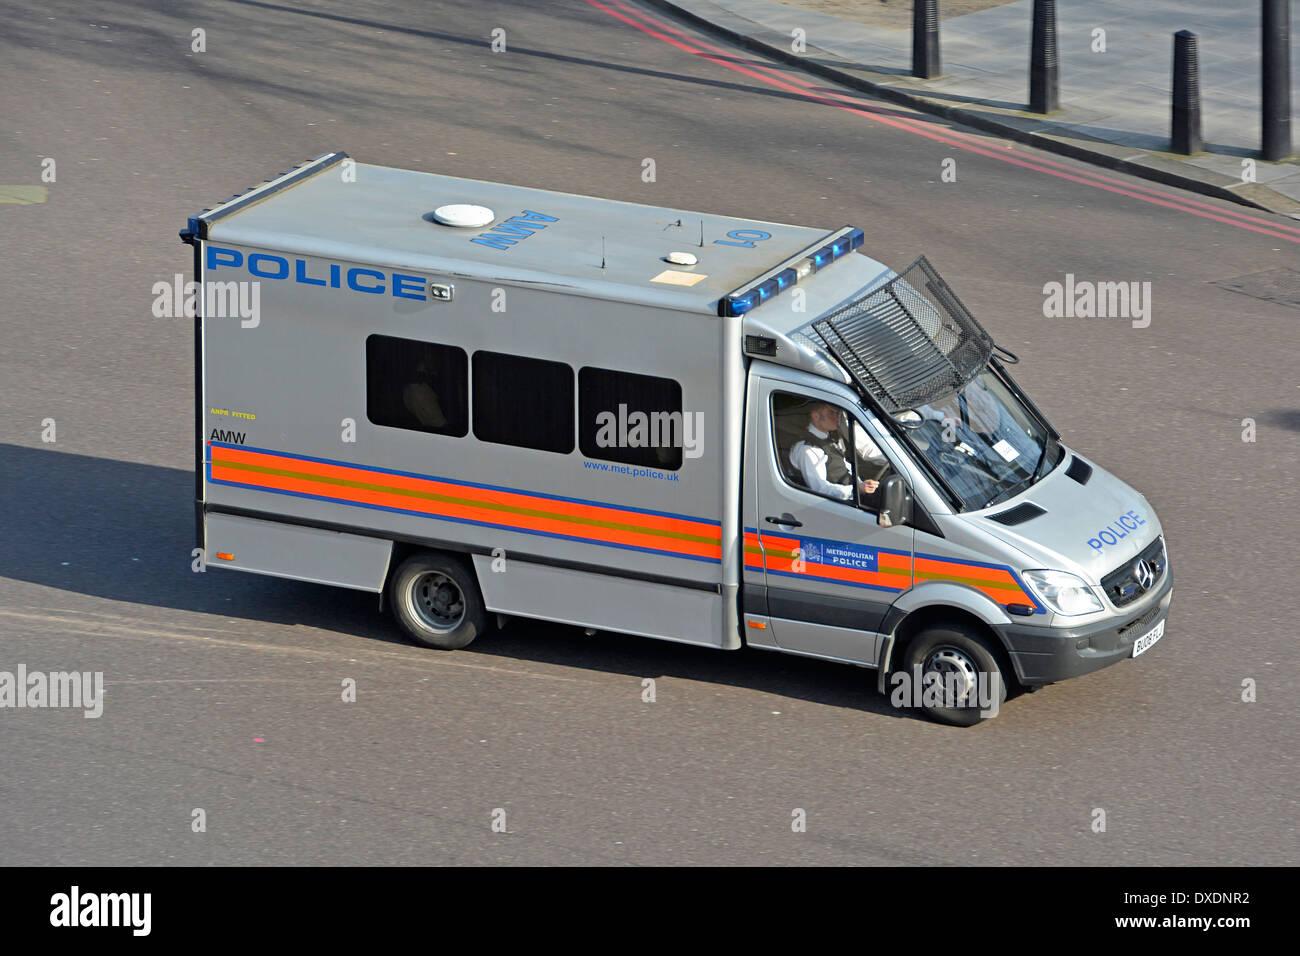 Police Van Stock Photos & Police Van Stock Images - Alamy